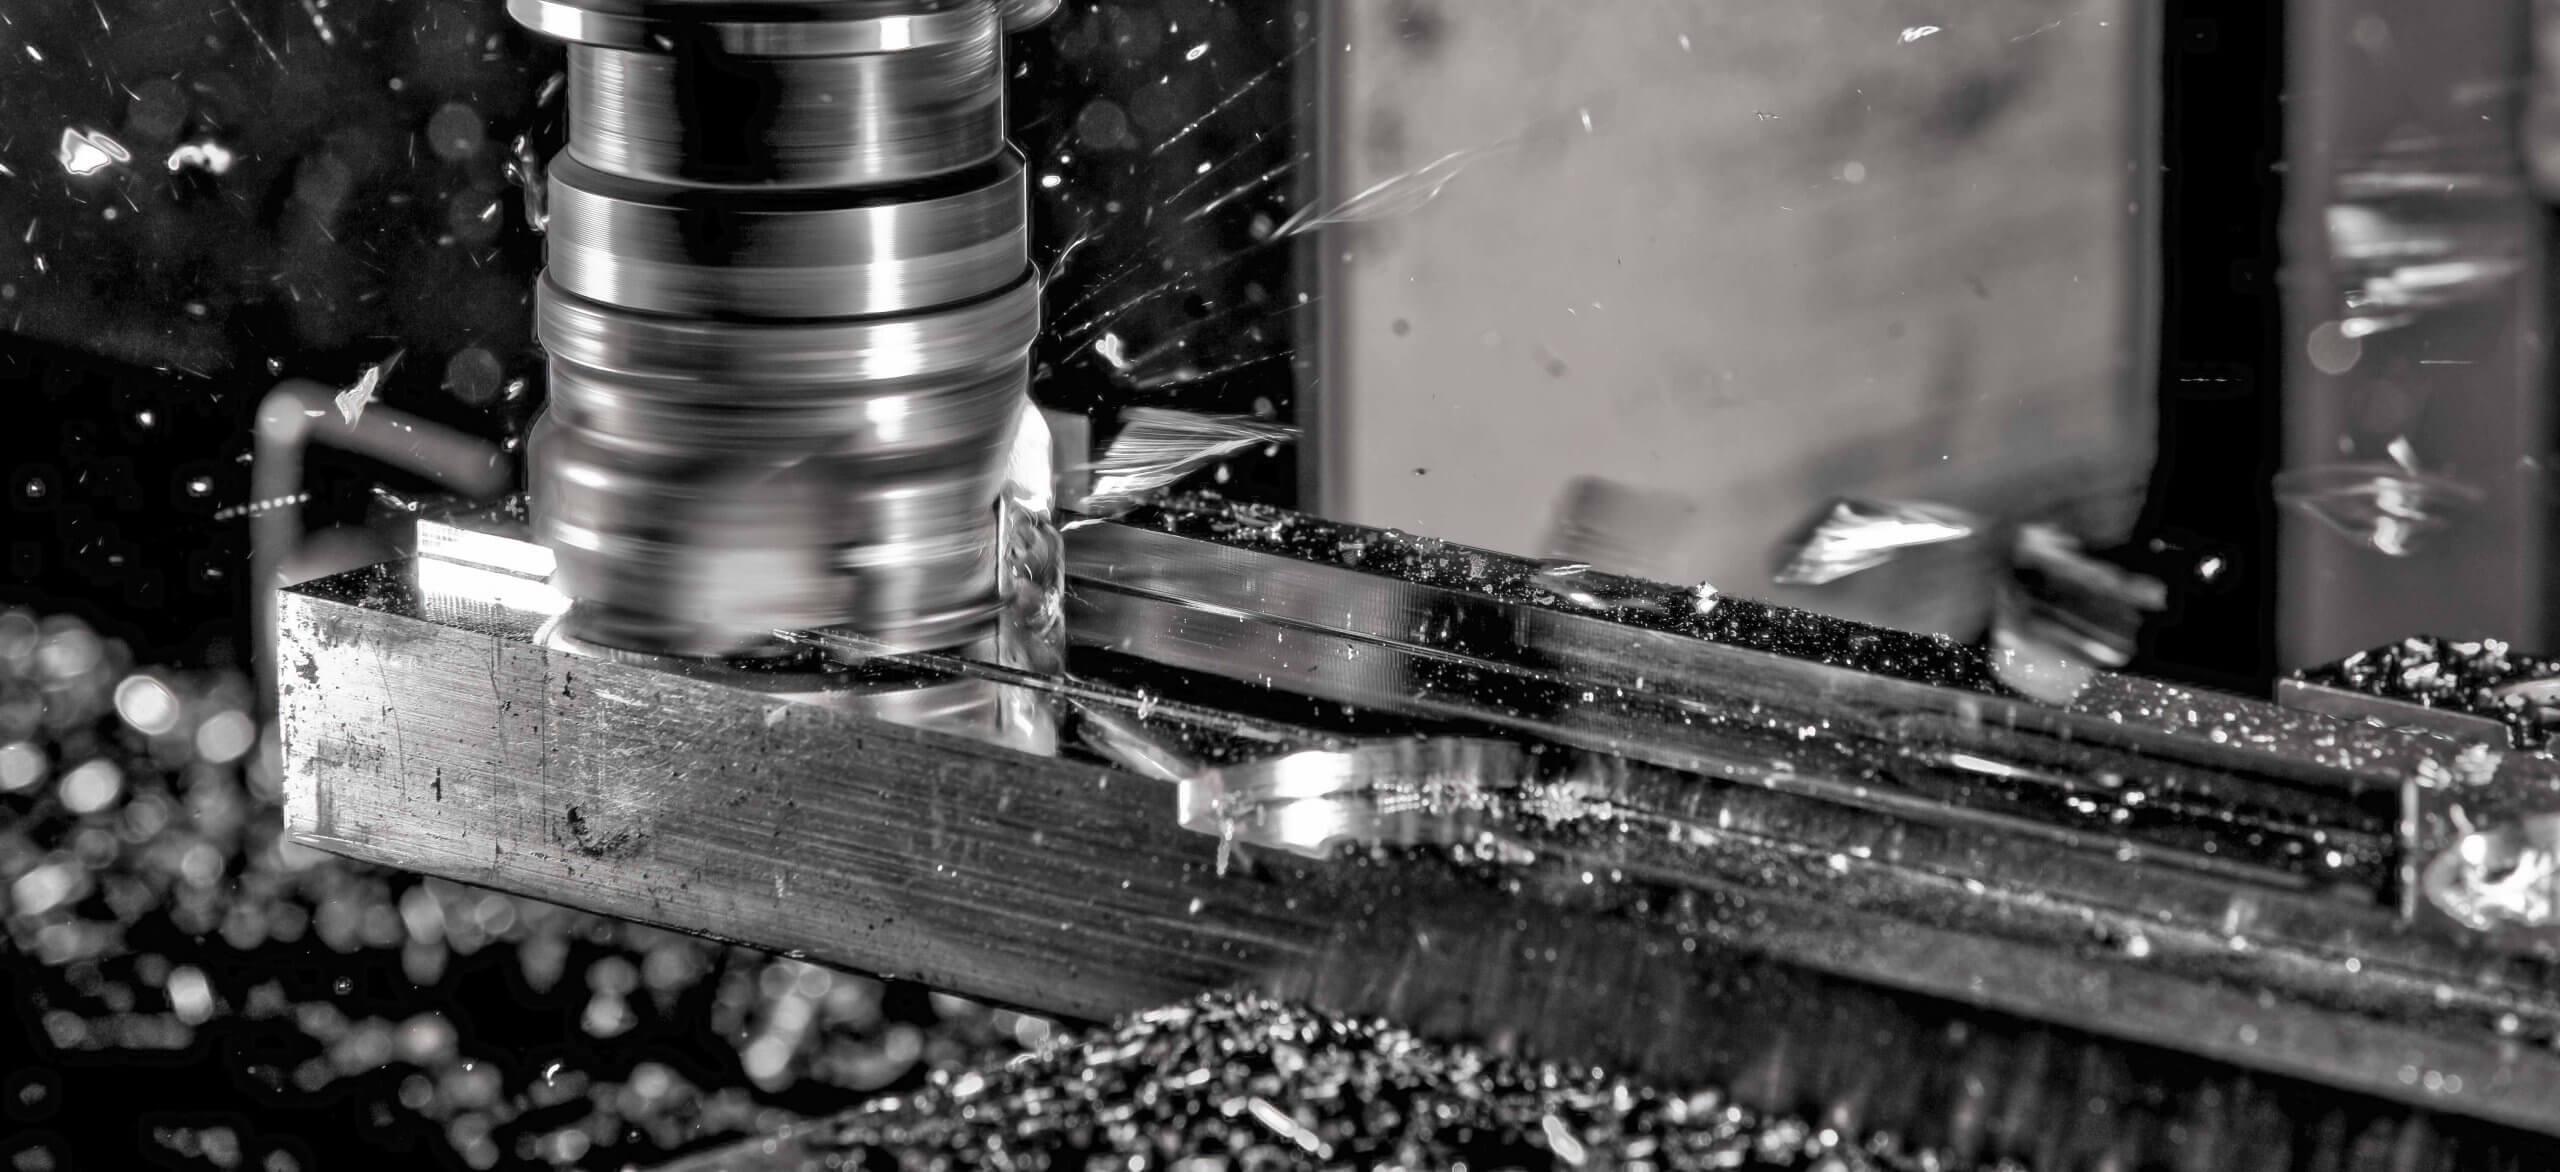 CNC milling swarf